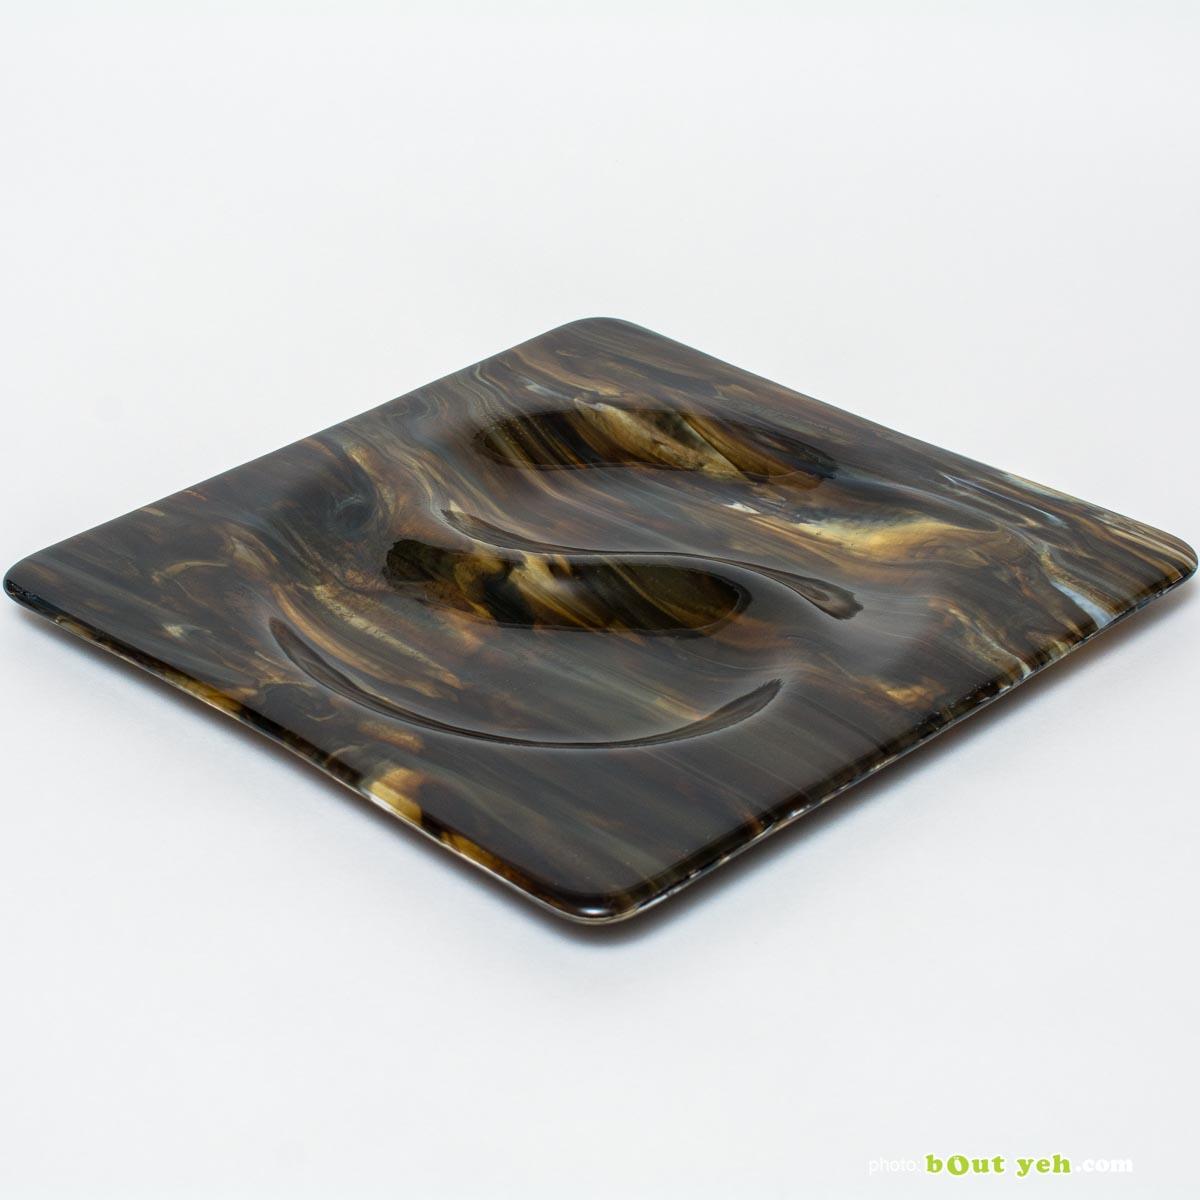 Ying yang square bullseye glass plate with copper patternation by Chris Sheppard Irish glassware - photo 1591